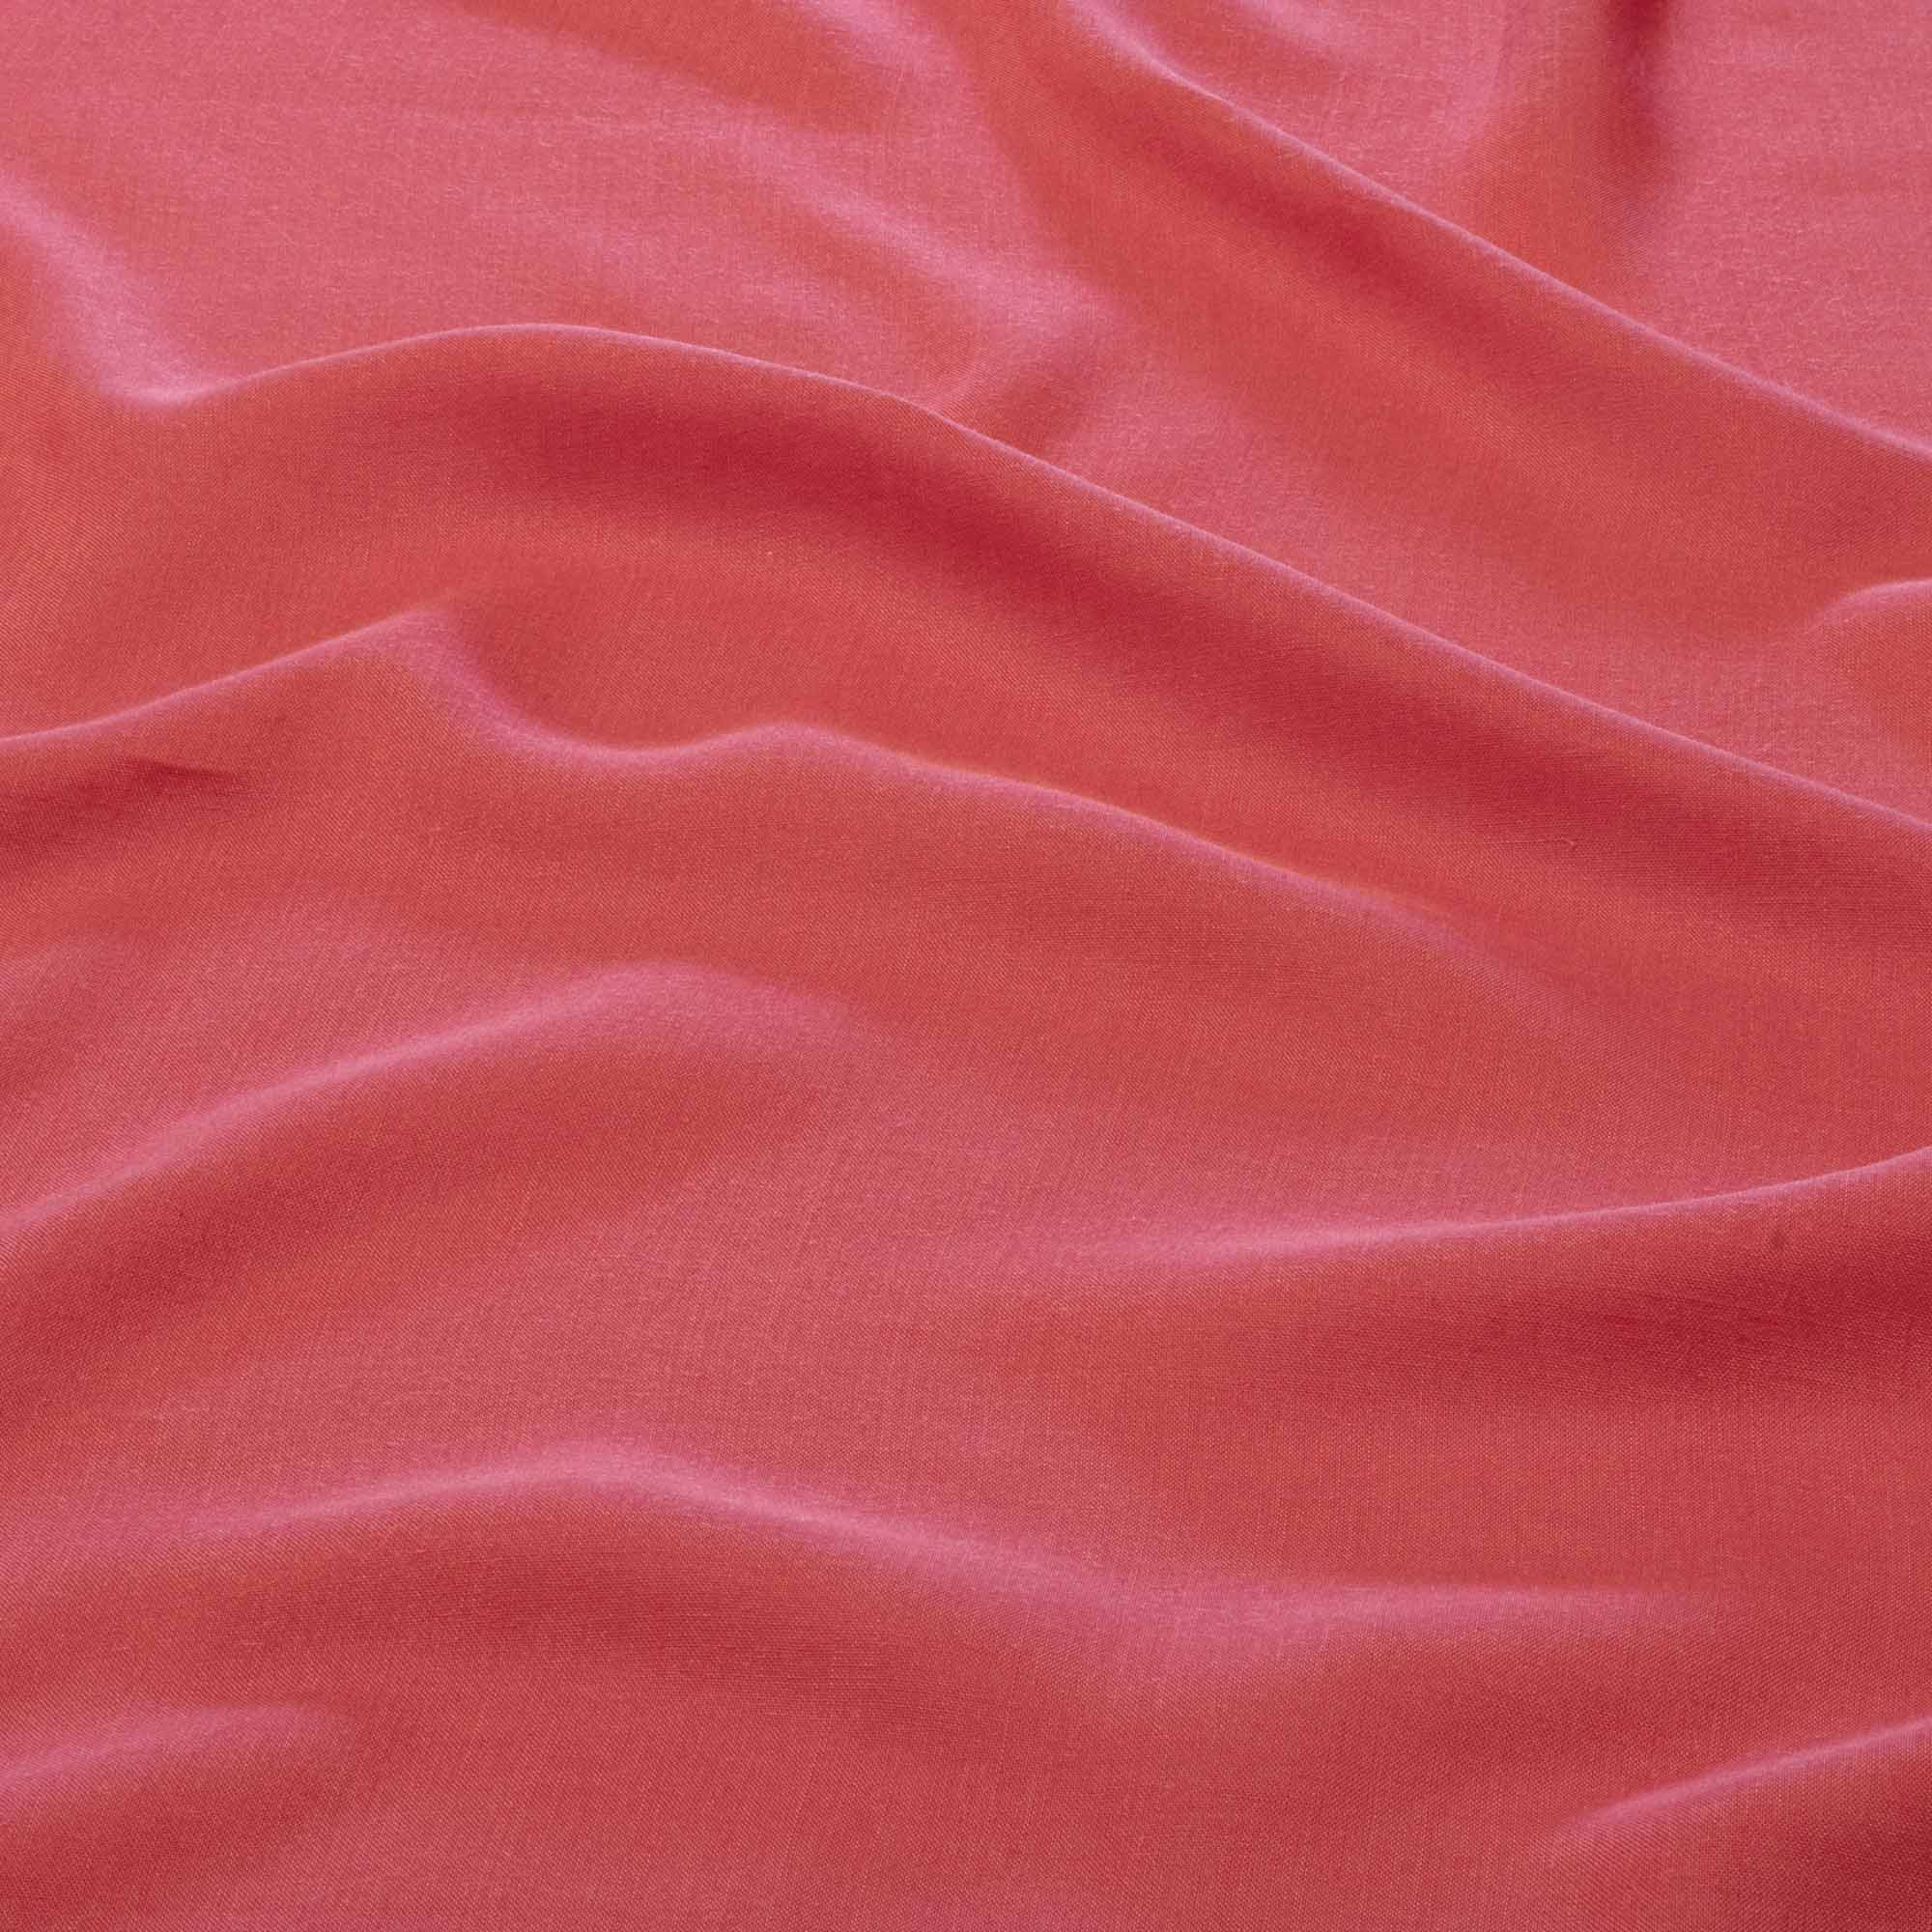 Tecido Viscose Rosa Chiclete 100% Viscose 1,40 m Largura